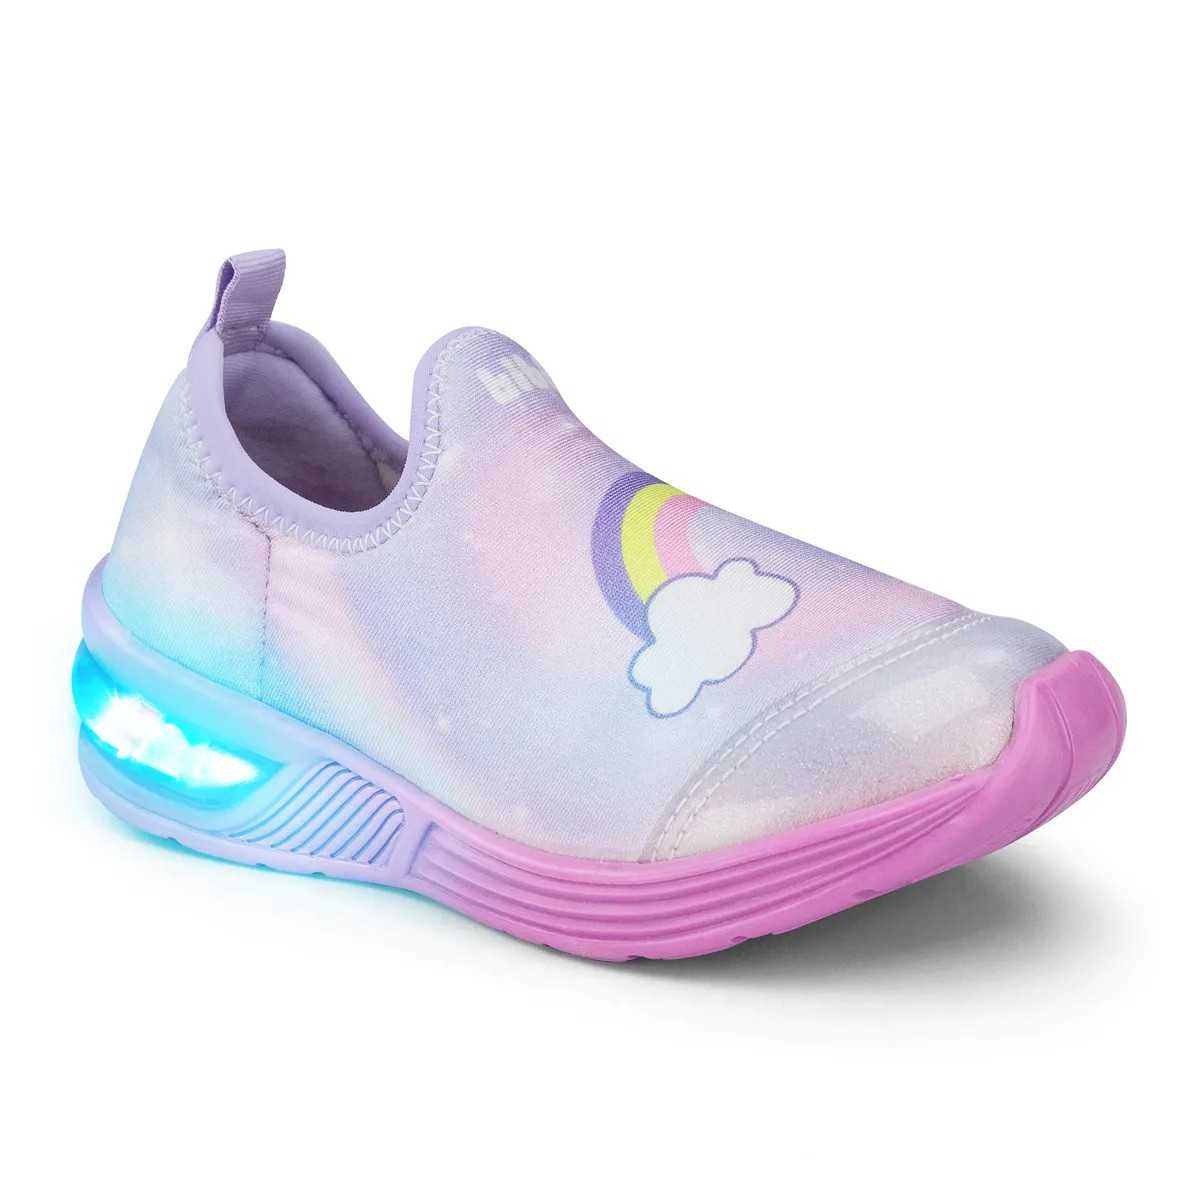 Tenis Infantil Bibi Space Wave Astral/Rosa - Unicornio